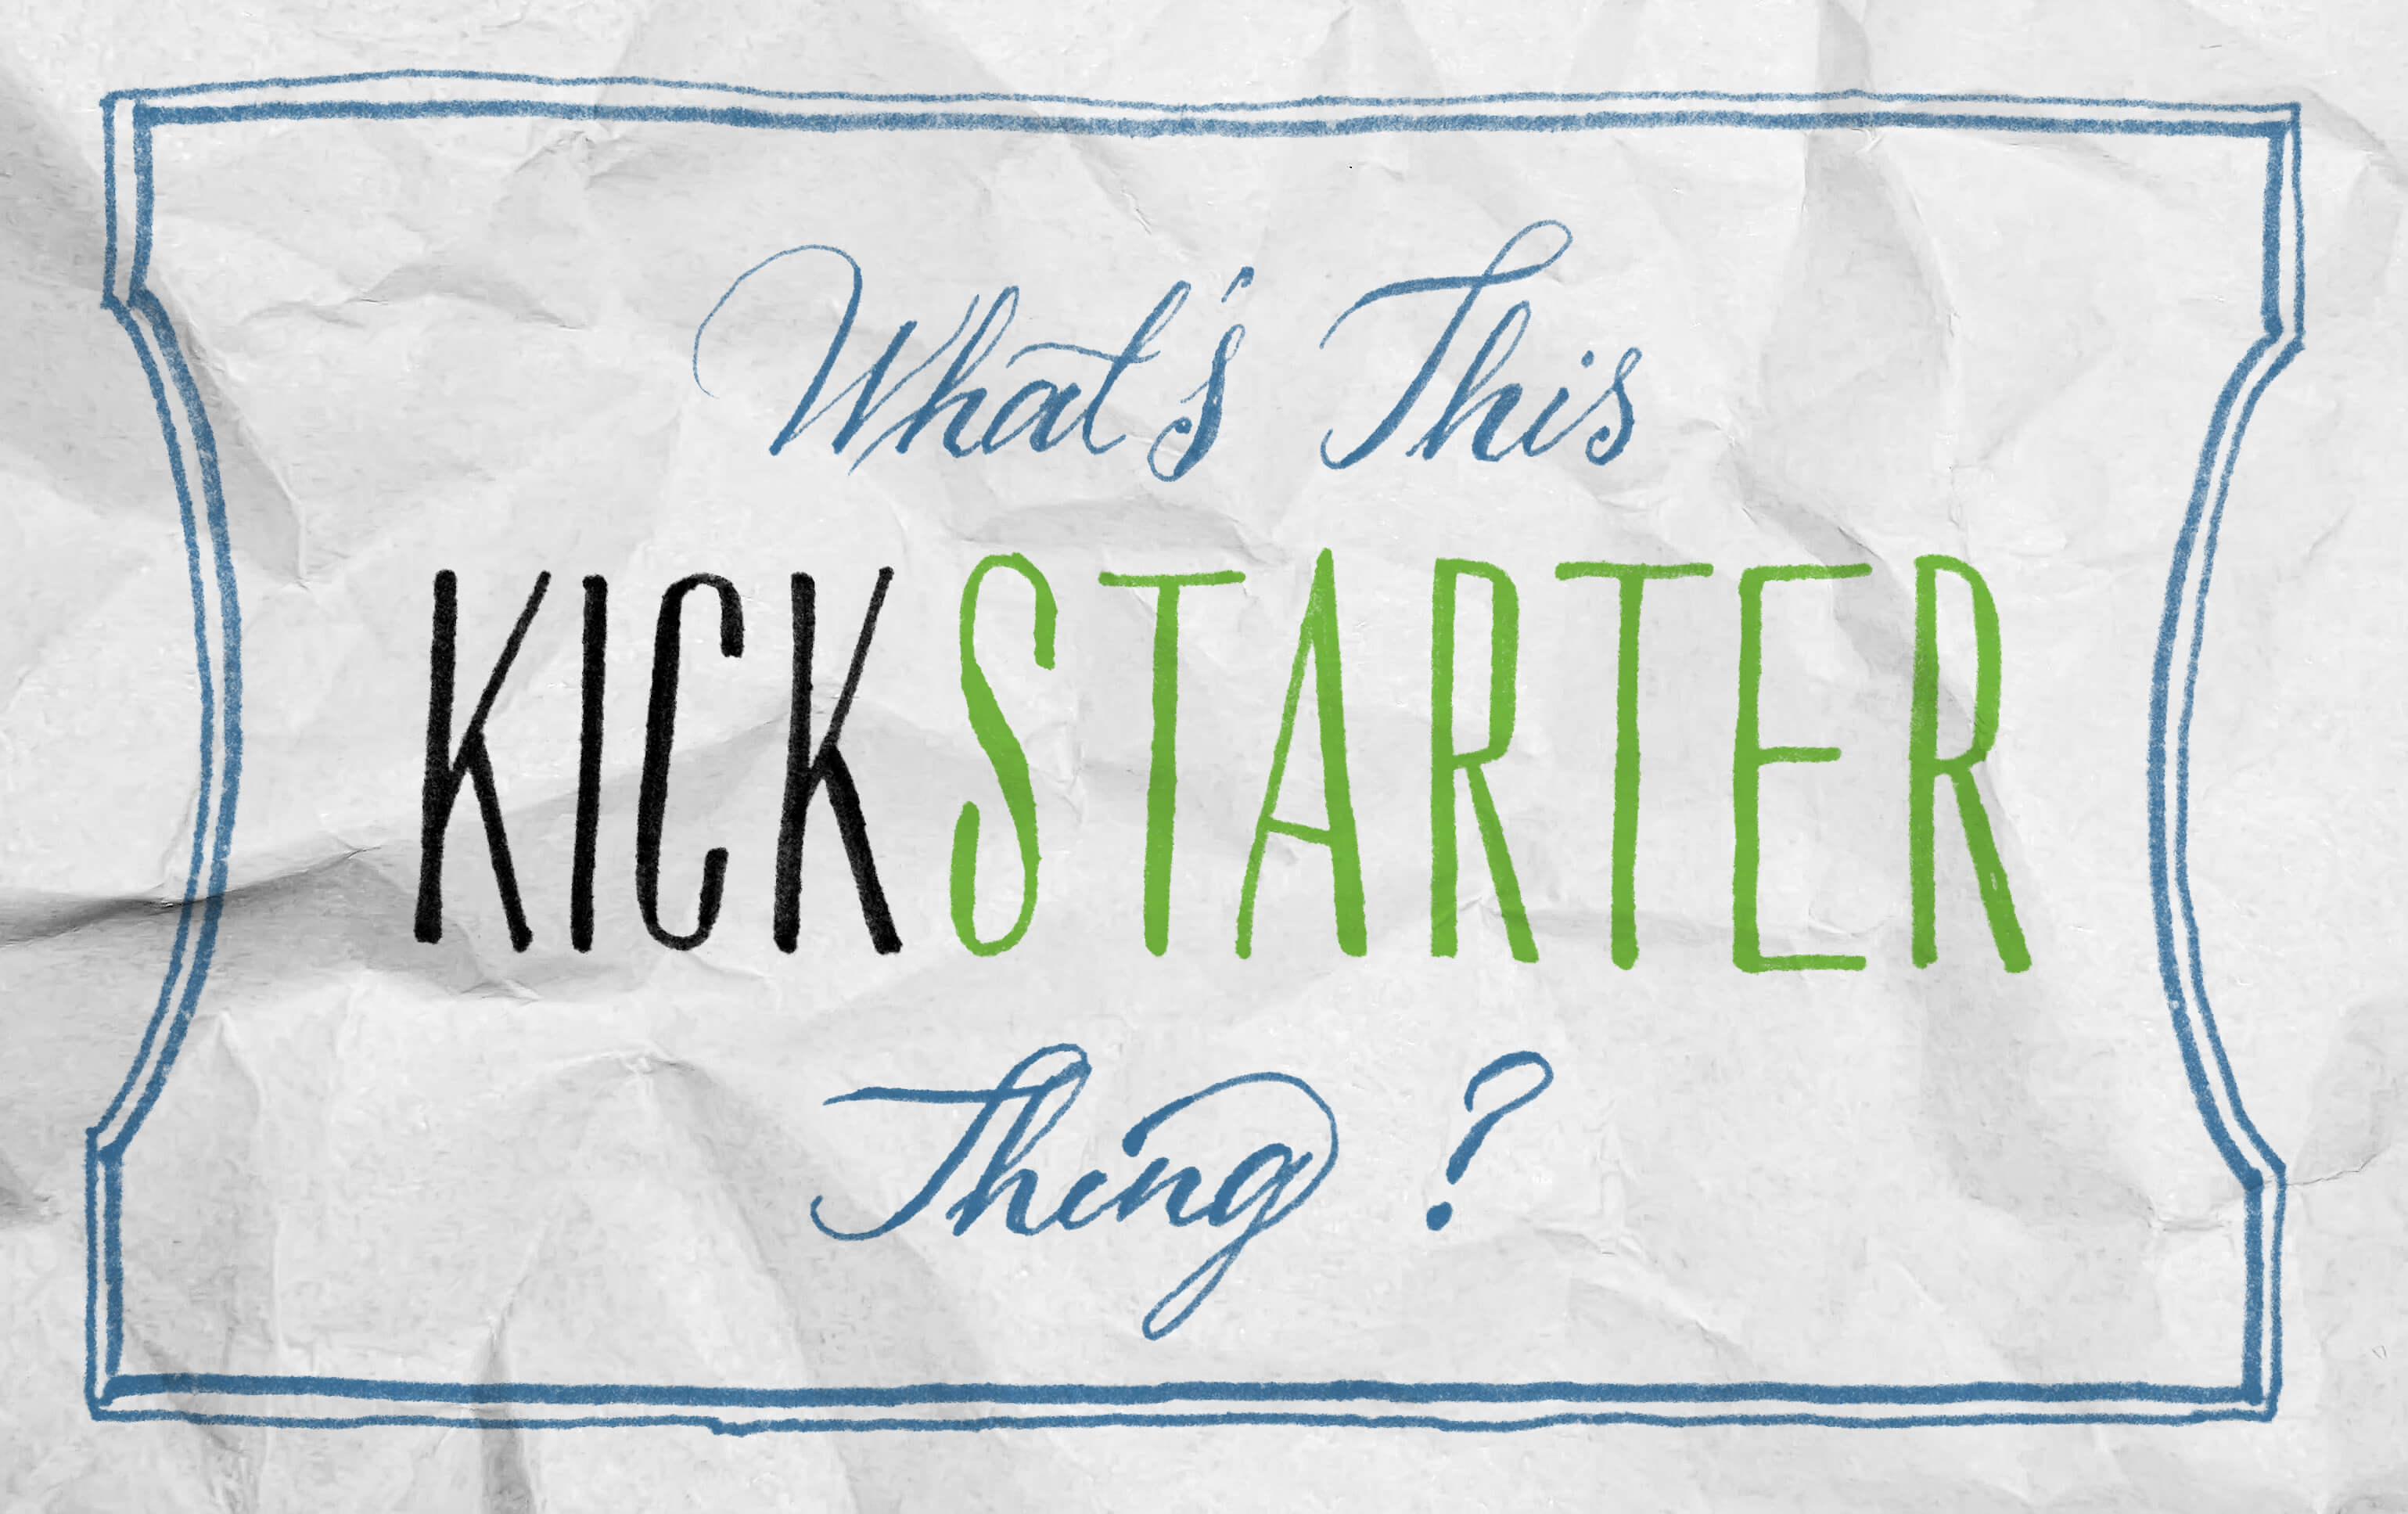 Geoff Moore 2015 Kickstarter Project